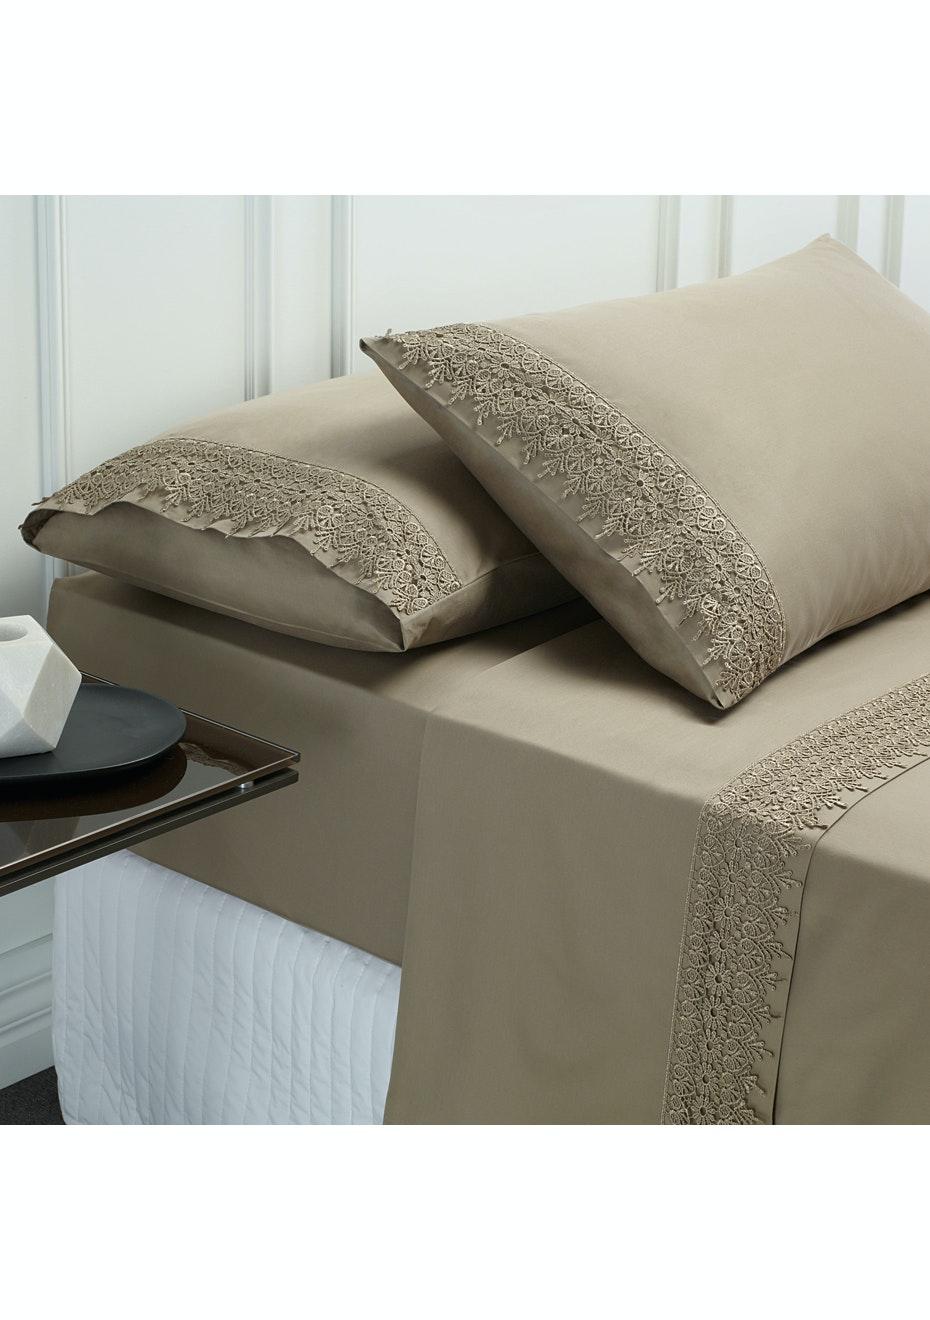 Style & Co 1000 Thread count Egyptian Cotton Hotel Collection Valencia Sheet sets Queen Linen